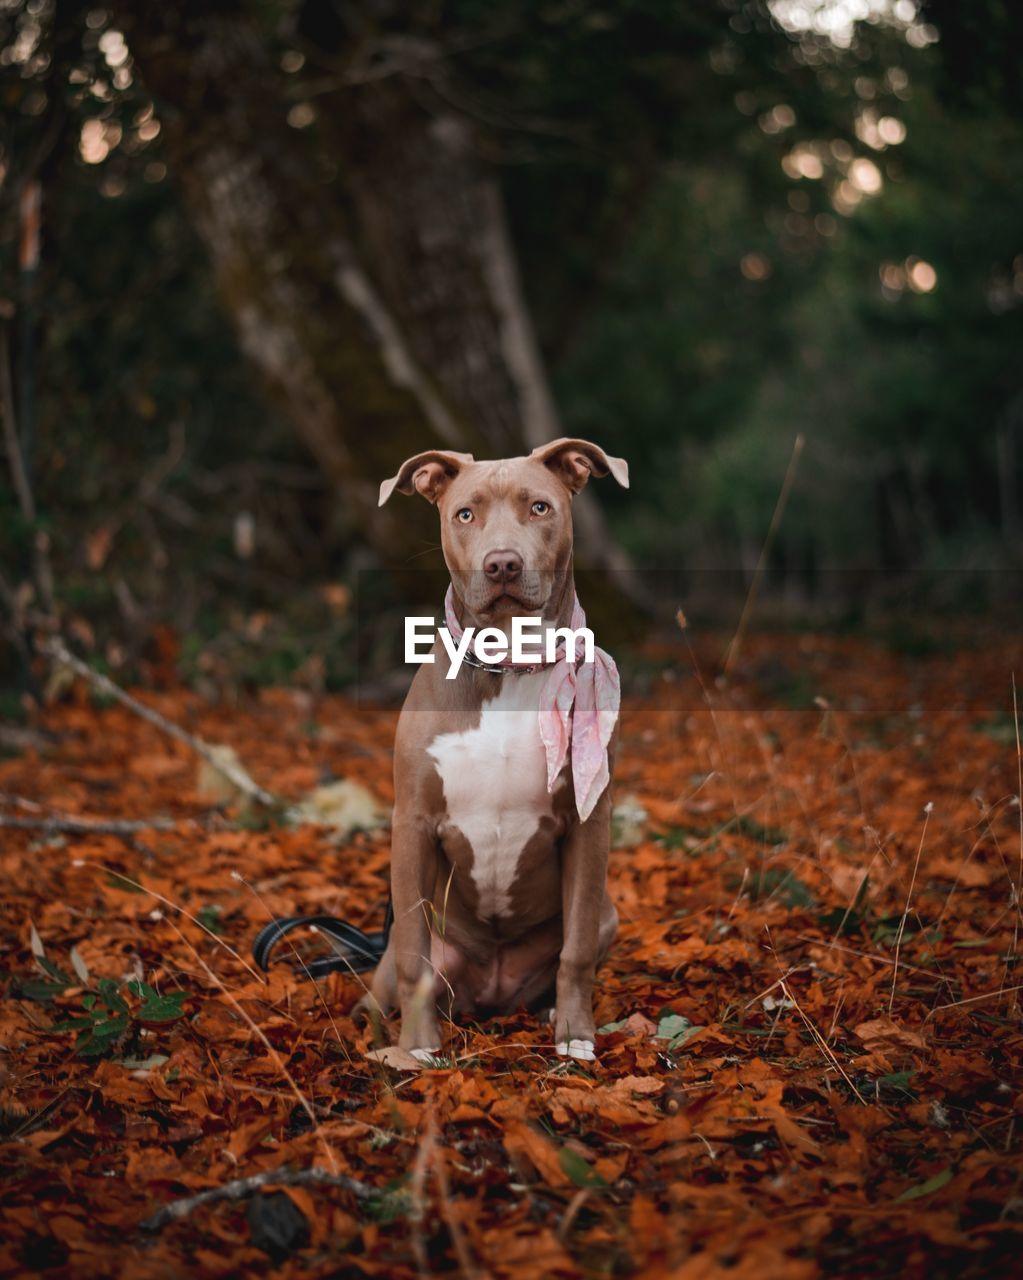 PORTRAIT OF DOG WEARING SUNGLASSES ON LAND